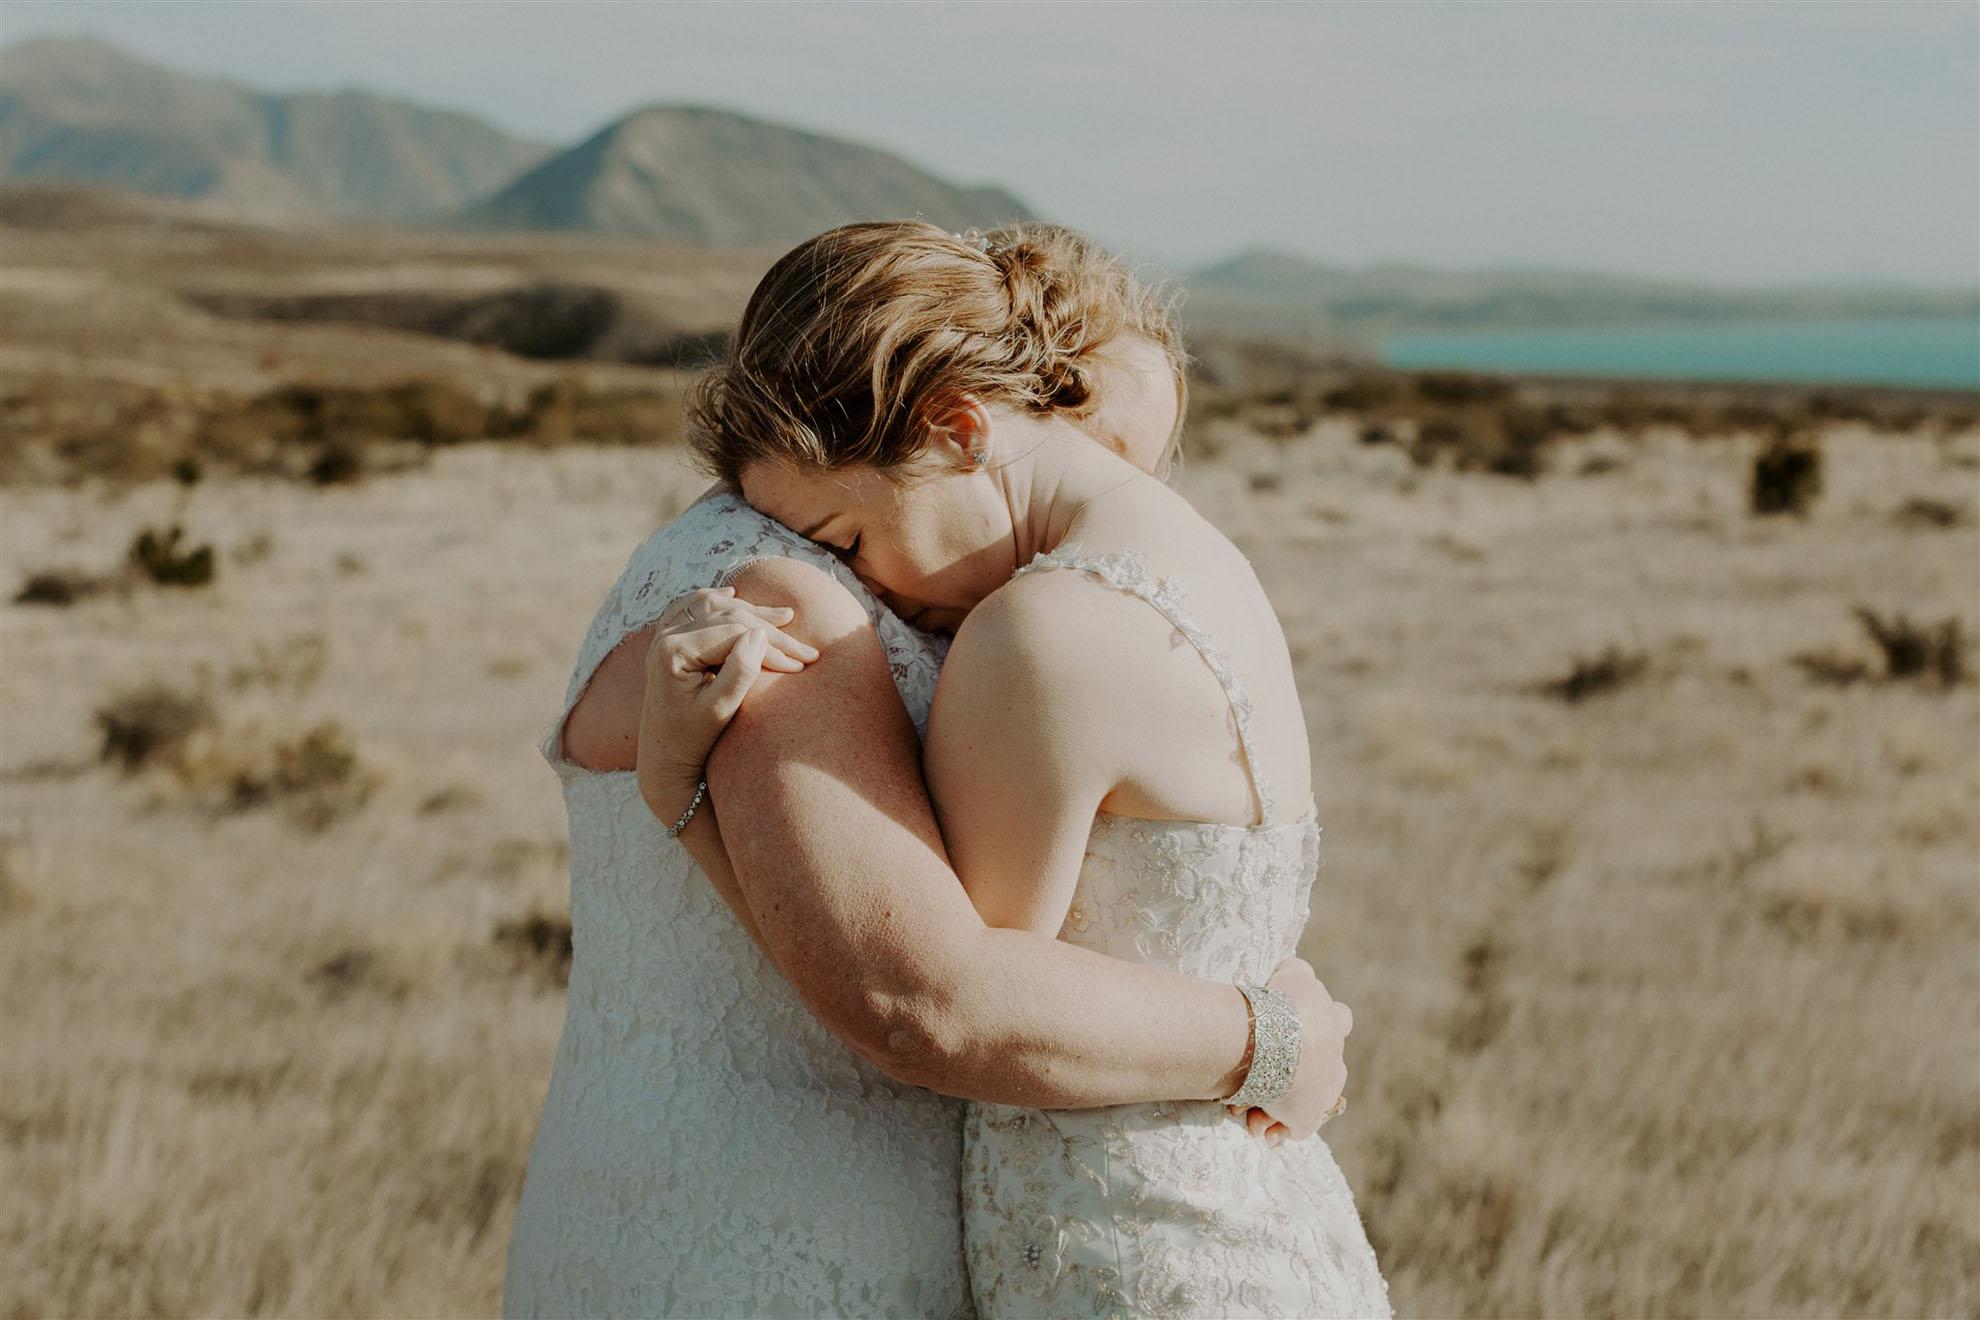 Frankly Faye lgbtqia+ photography lesbian wedding elopement Lake Tekapo New Zealand Dancing With Her magazine